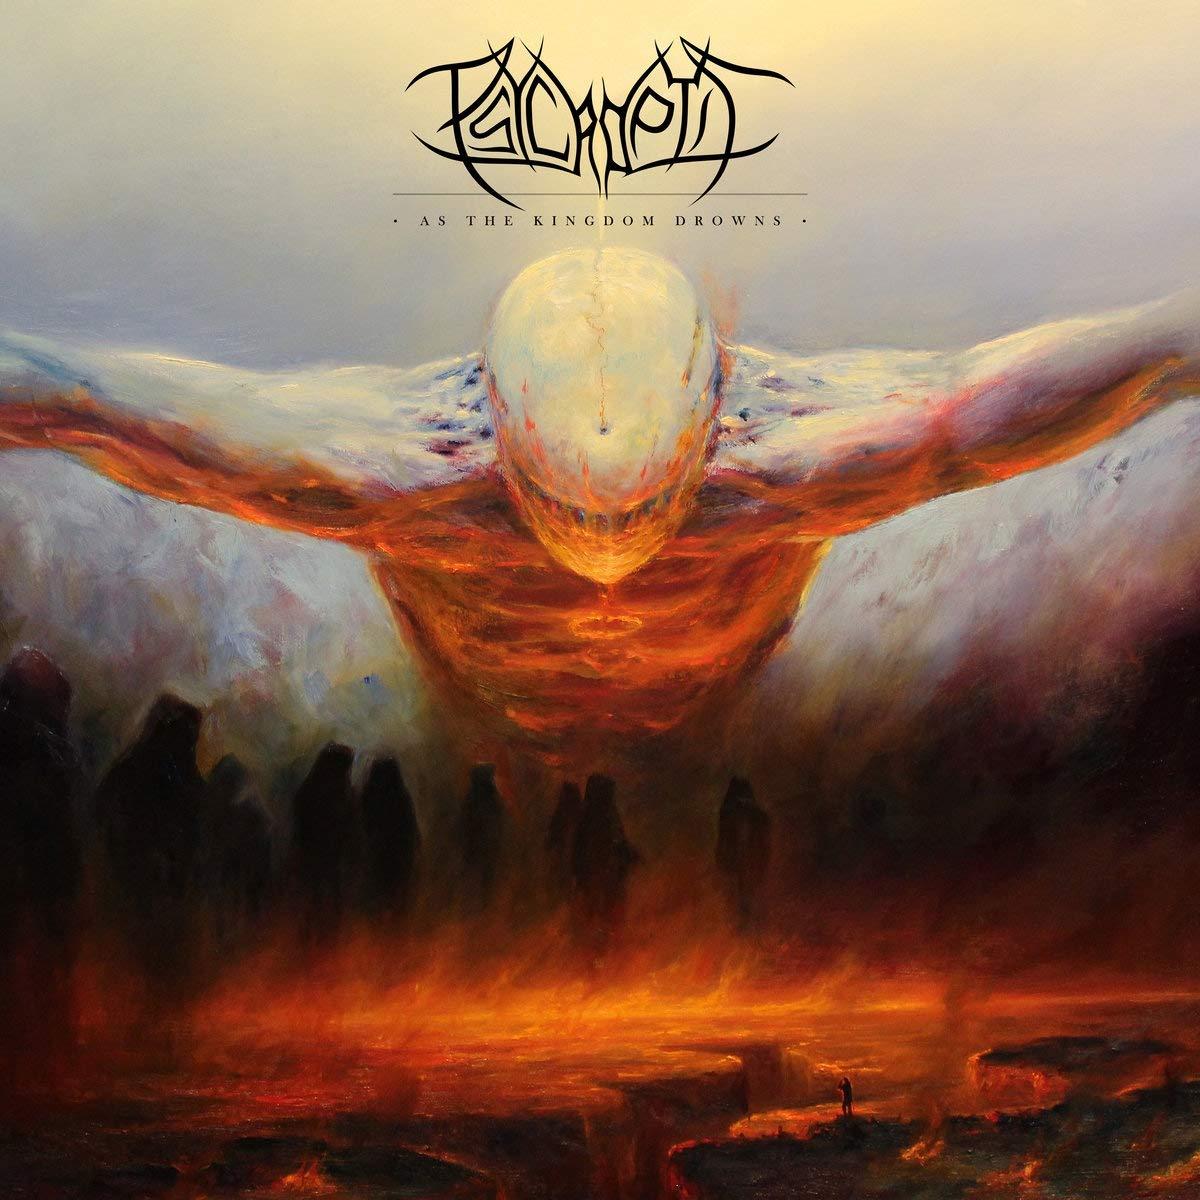 CD : Psycroptic - As The Kingdom Drowns (CD)